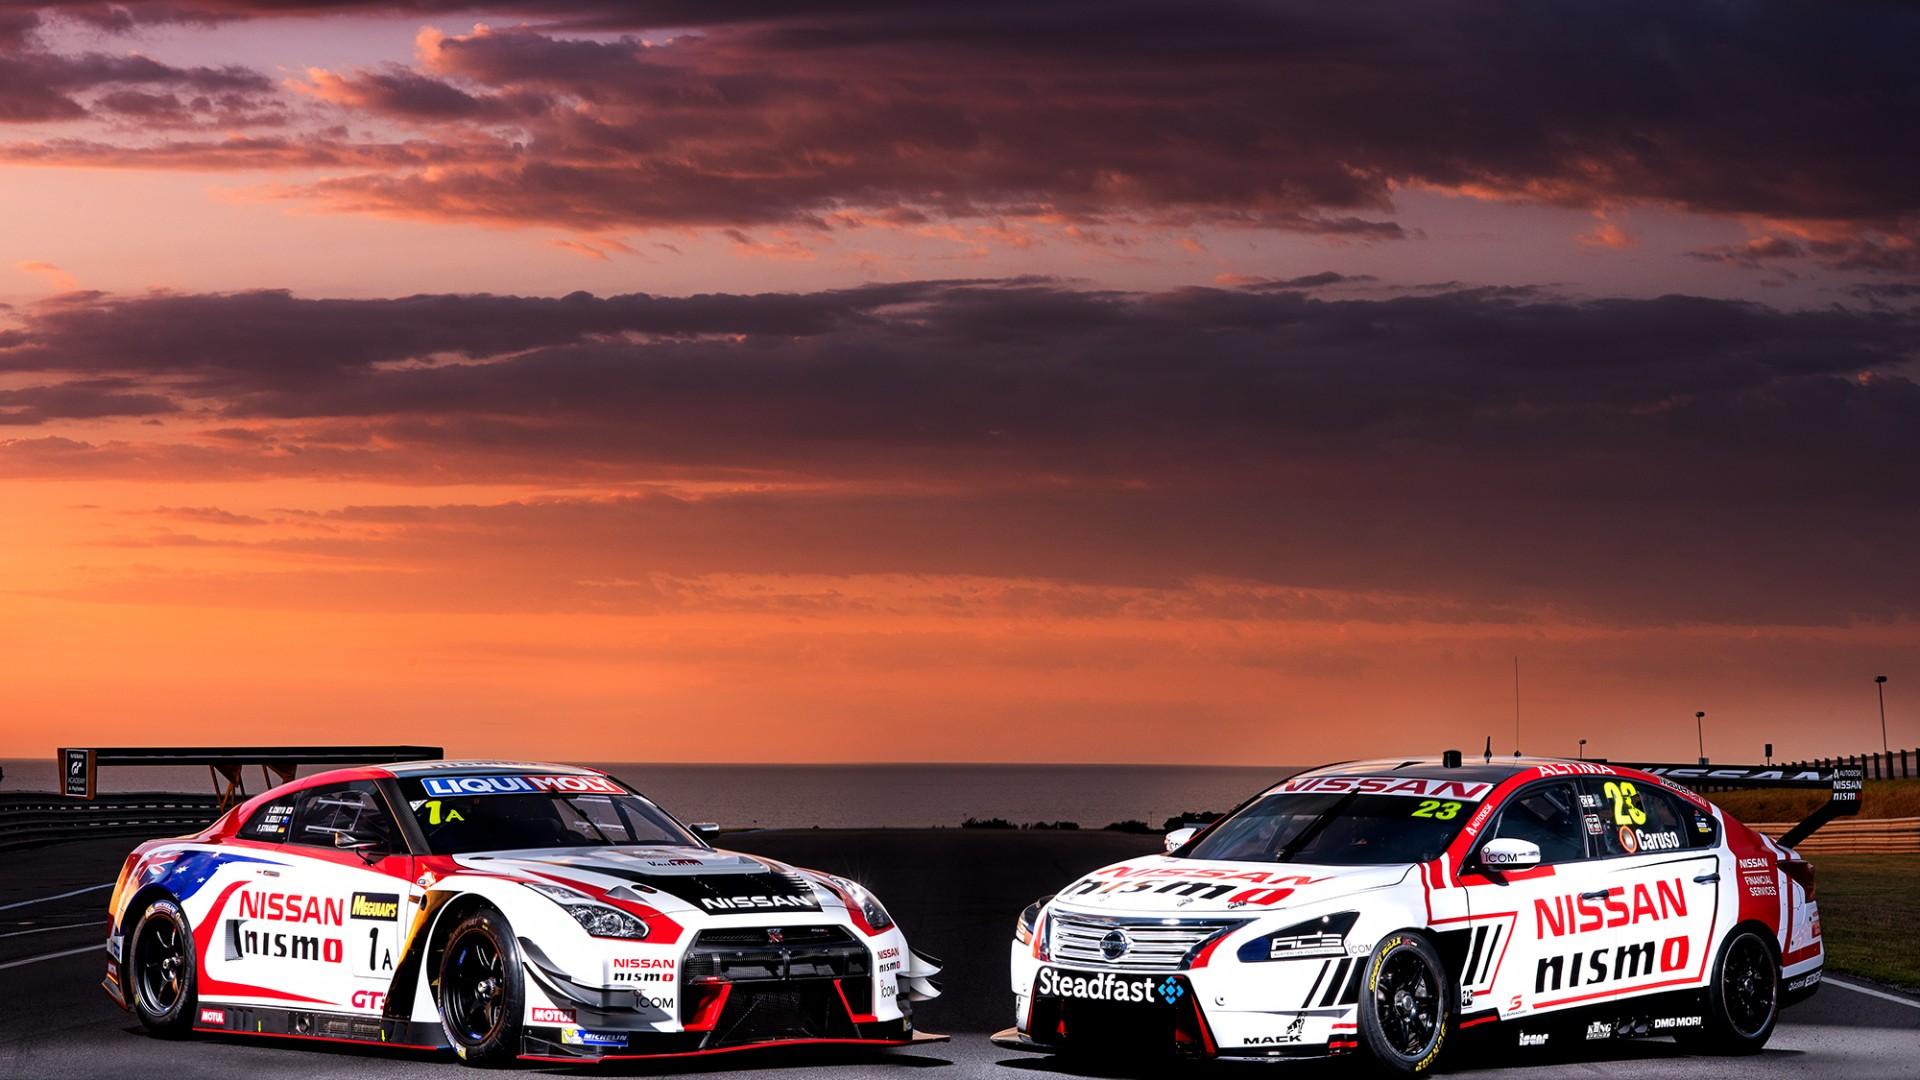 2016 NISSAN MOTORSPORT AUSTRALIA 01 (LOW RES)